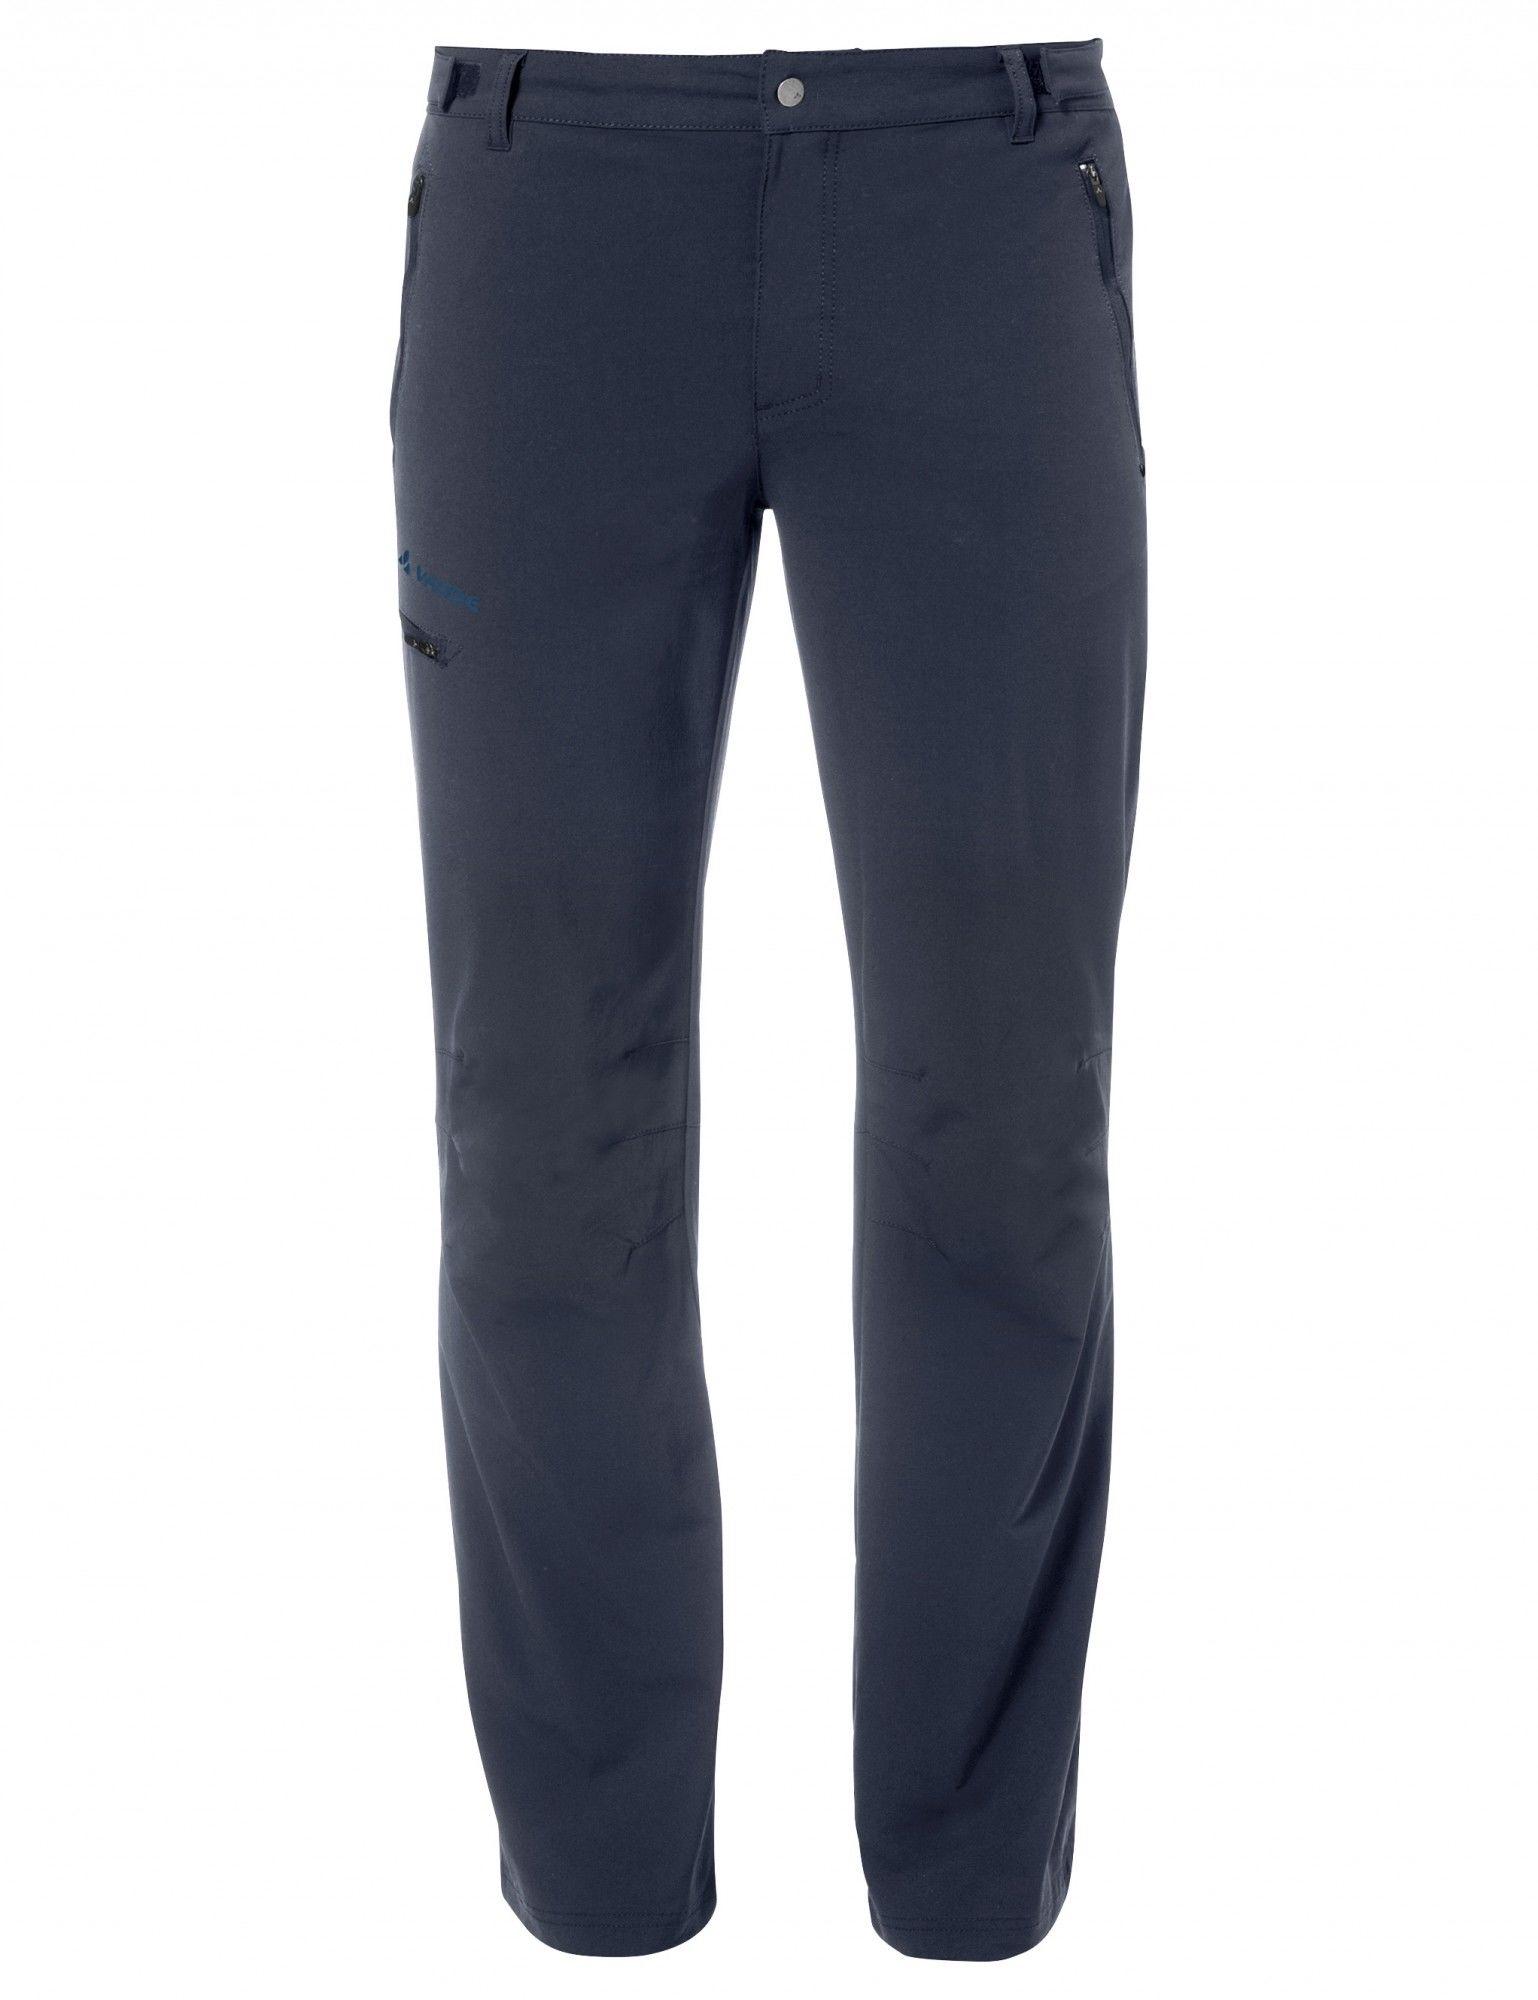 Vaude Farley Stretch Pants II Blau, Male 52 -Regular -Farbe Eclipse, 52 -Regular